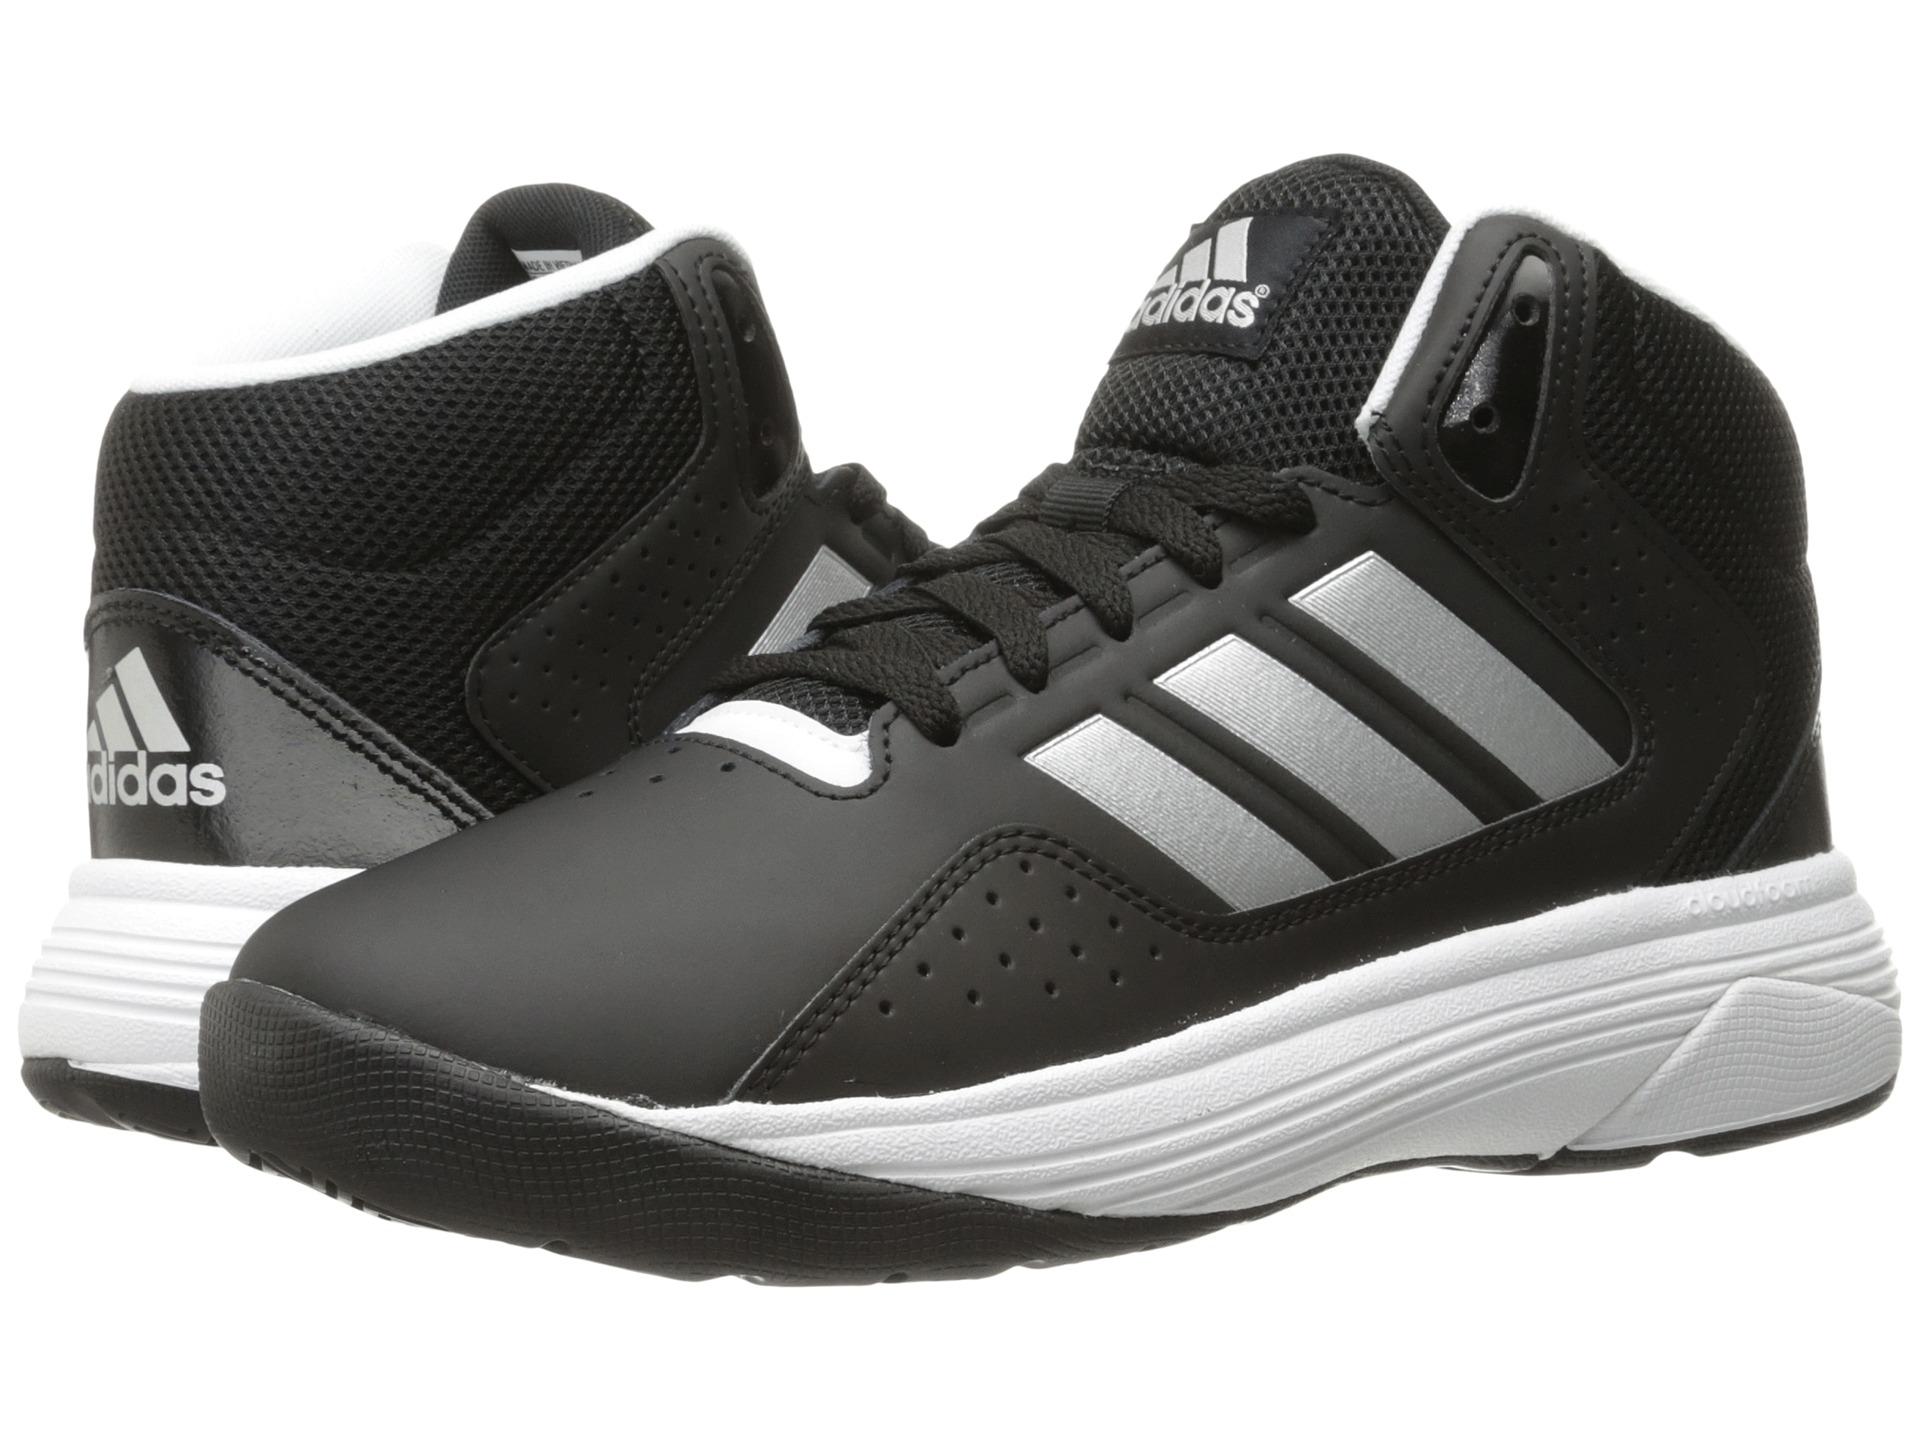 Adidas Cloudfoam Ilation Mid Men S Leather Basketball Shoes